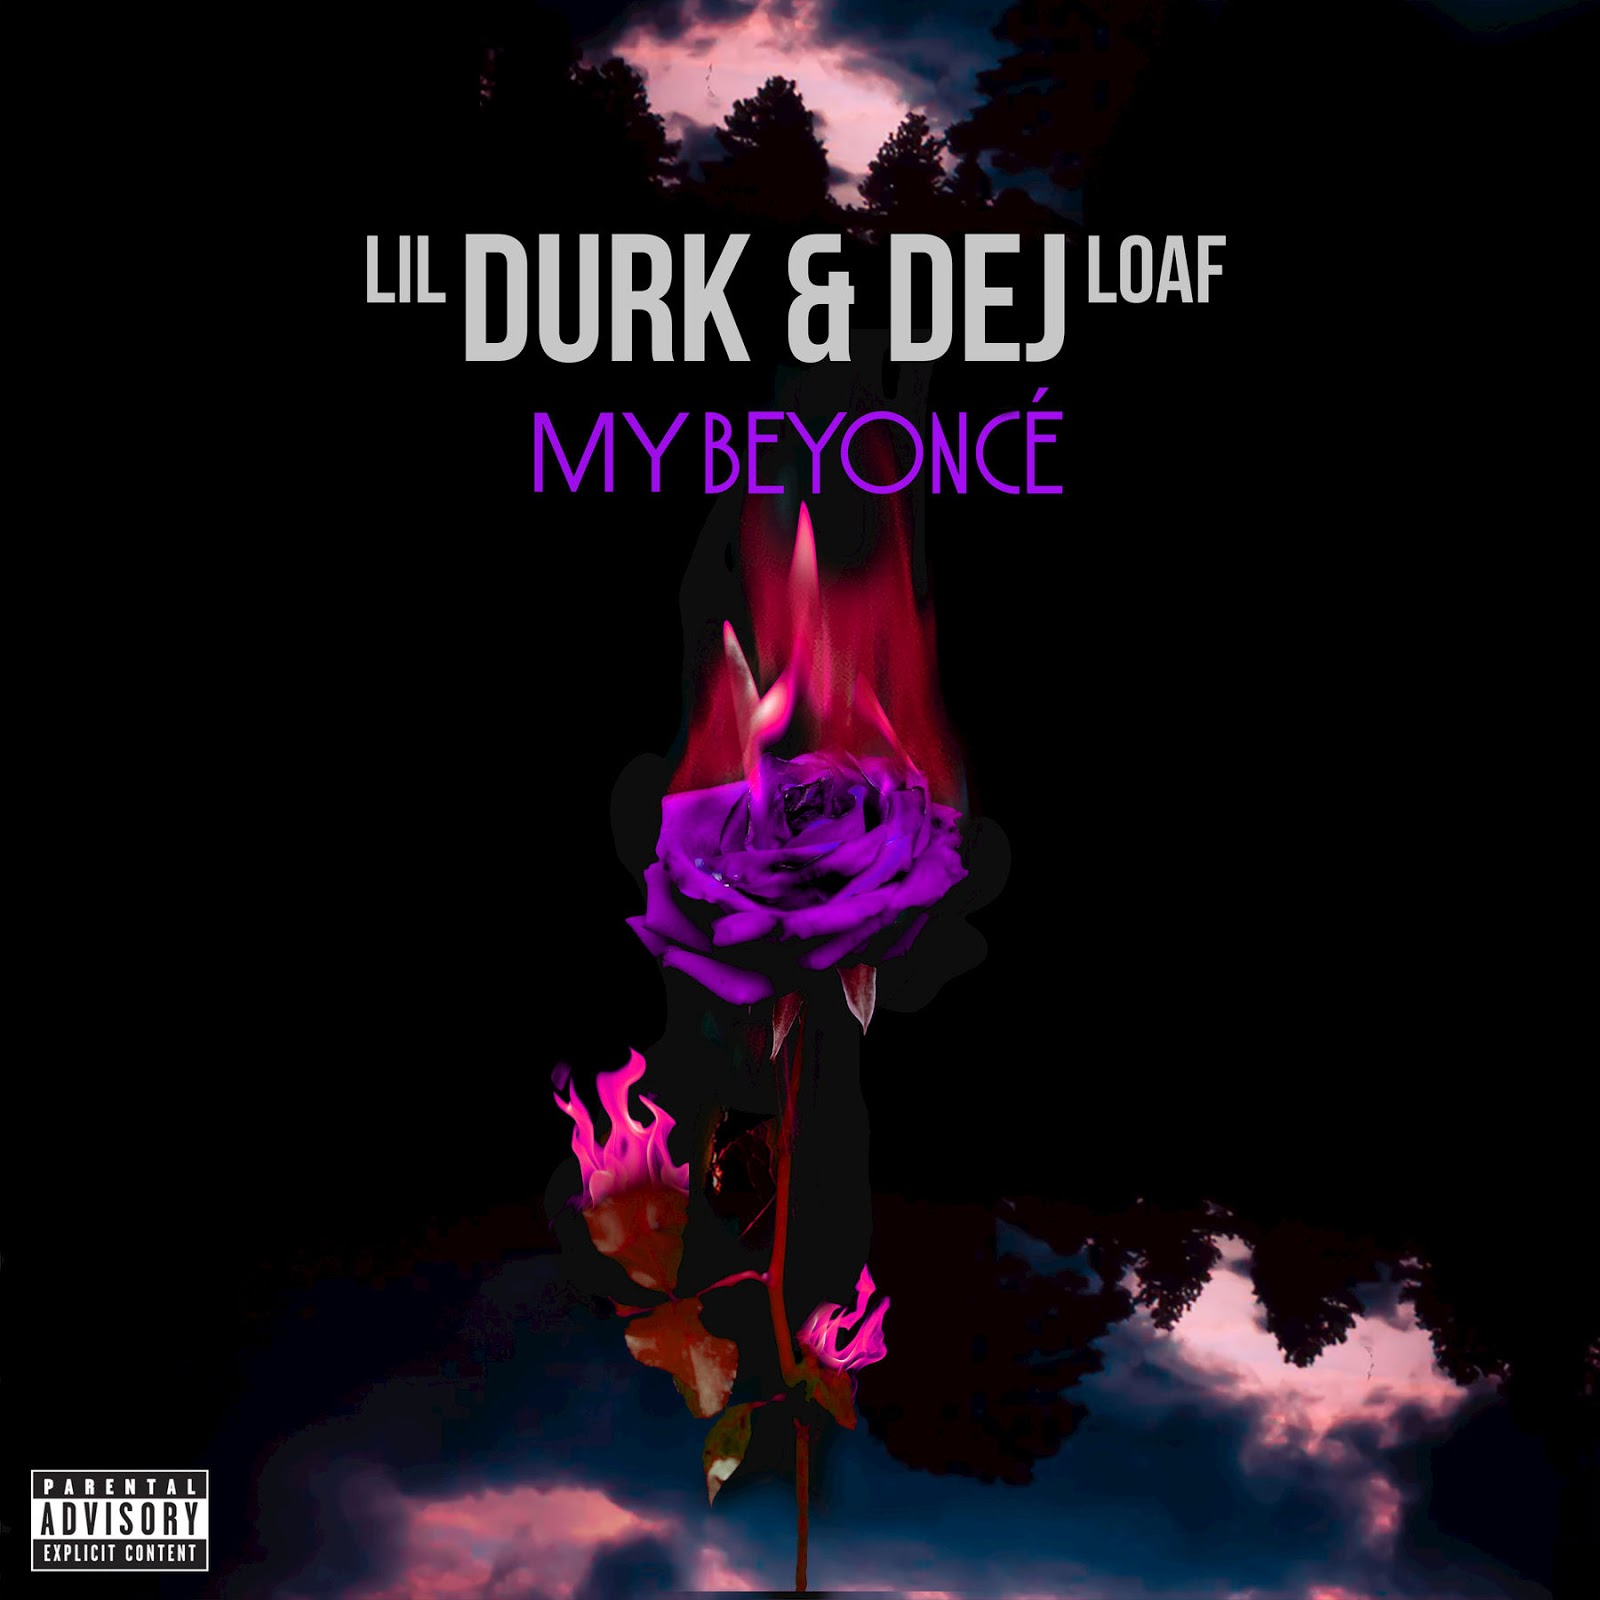 Lil Durk - My Beyoncé (feat. DeJ Loaf) - Single Cover